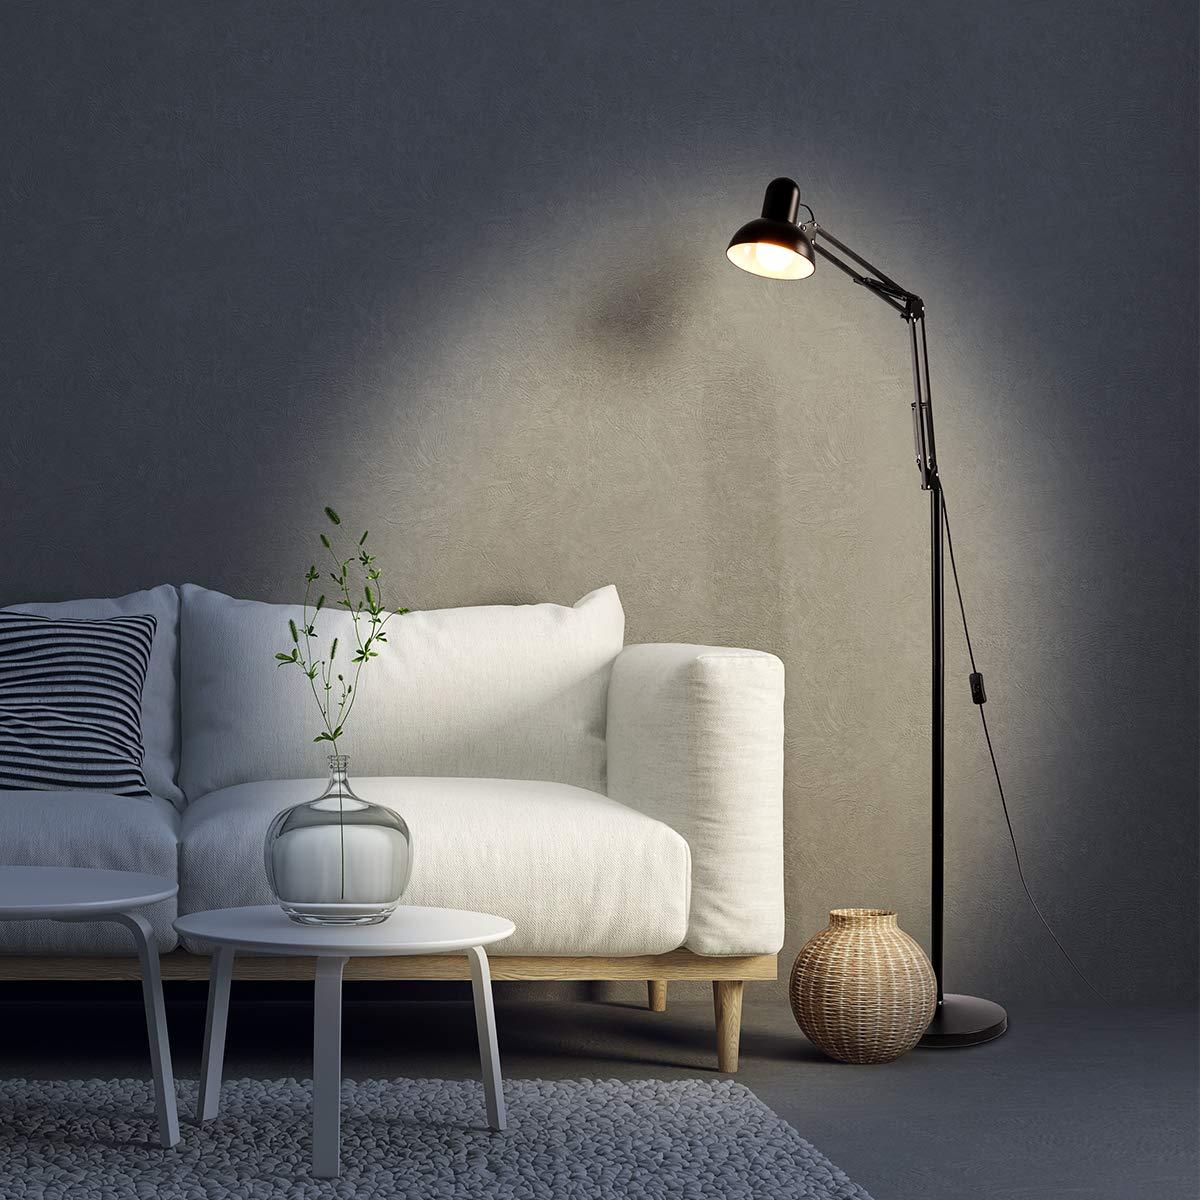 Sunix LED Reading Floor Lamp, Dimmable, Energy Saving, Full Spectrum Natural Daylight Sunlight, LED Standing Light with Adjustable Gooseneck for Living Room Bedroom Office Task (Including a Bulb)